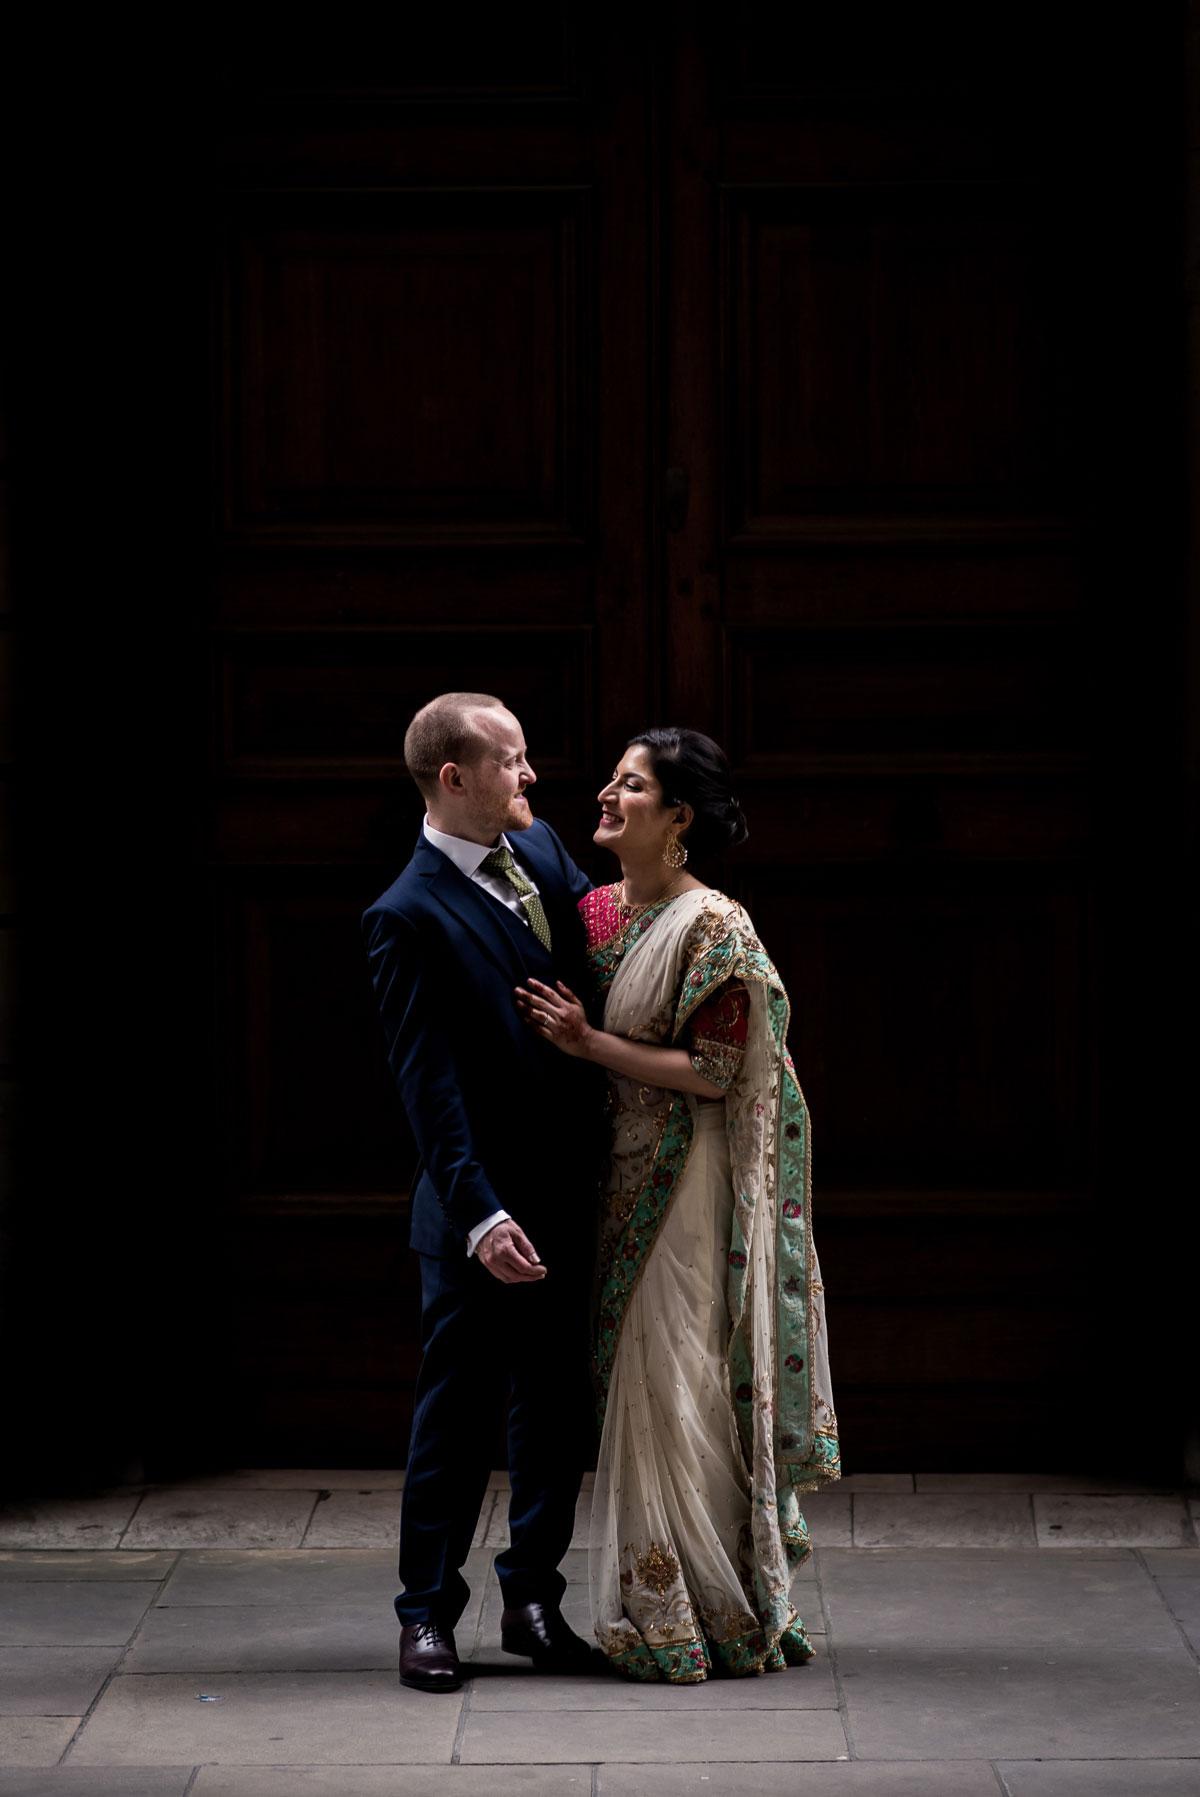 wedding-at-st-brides-0002